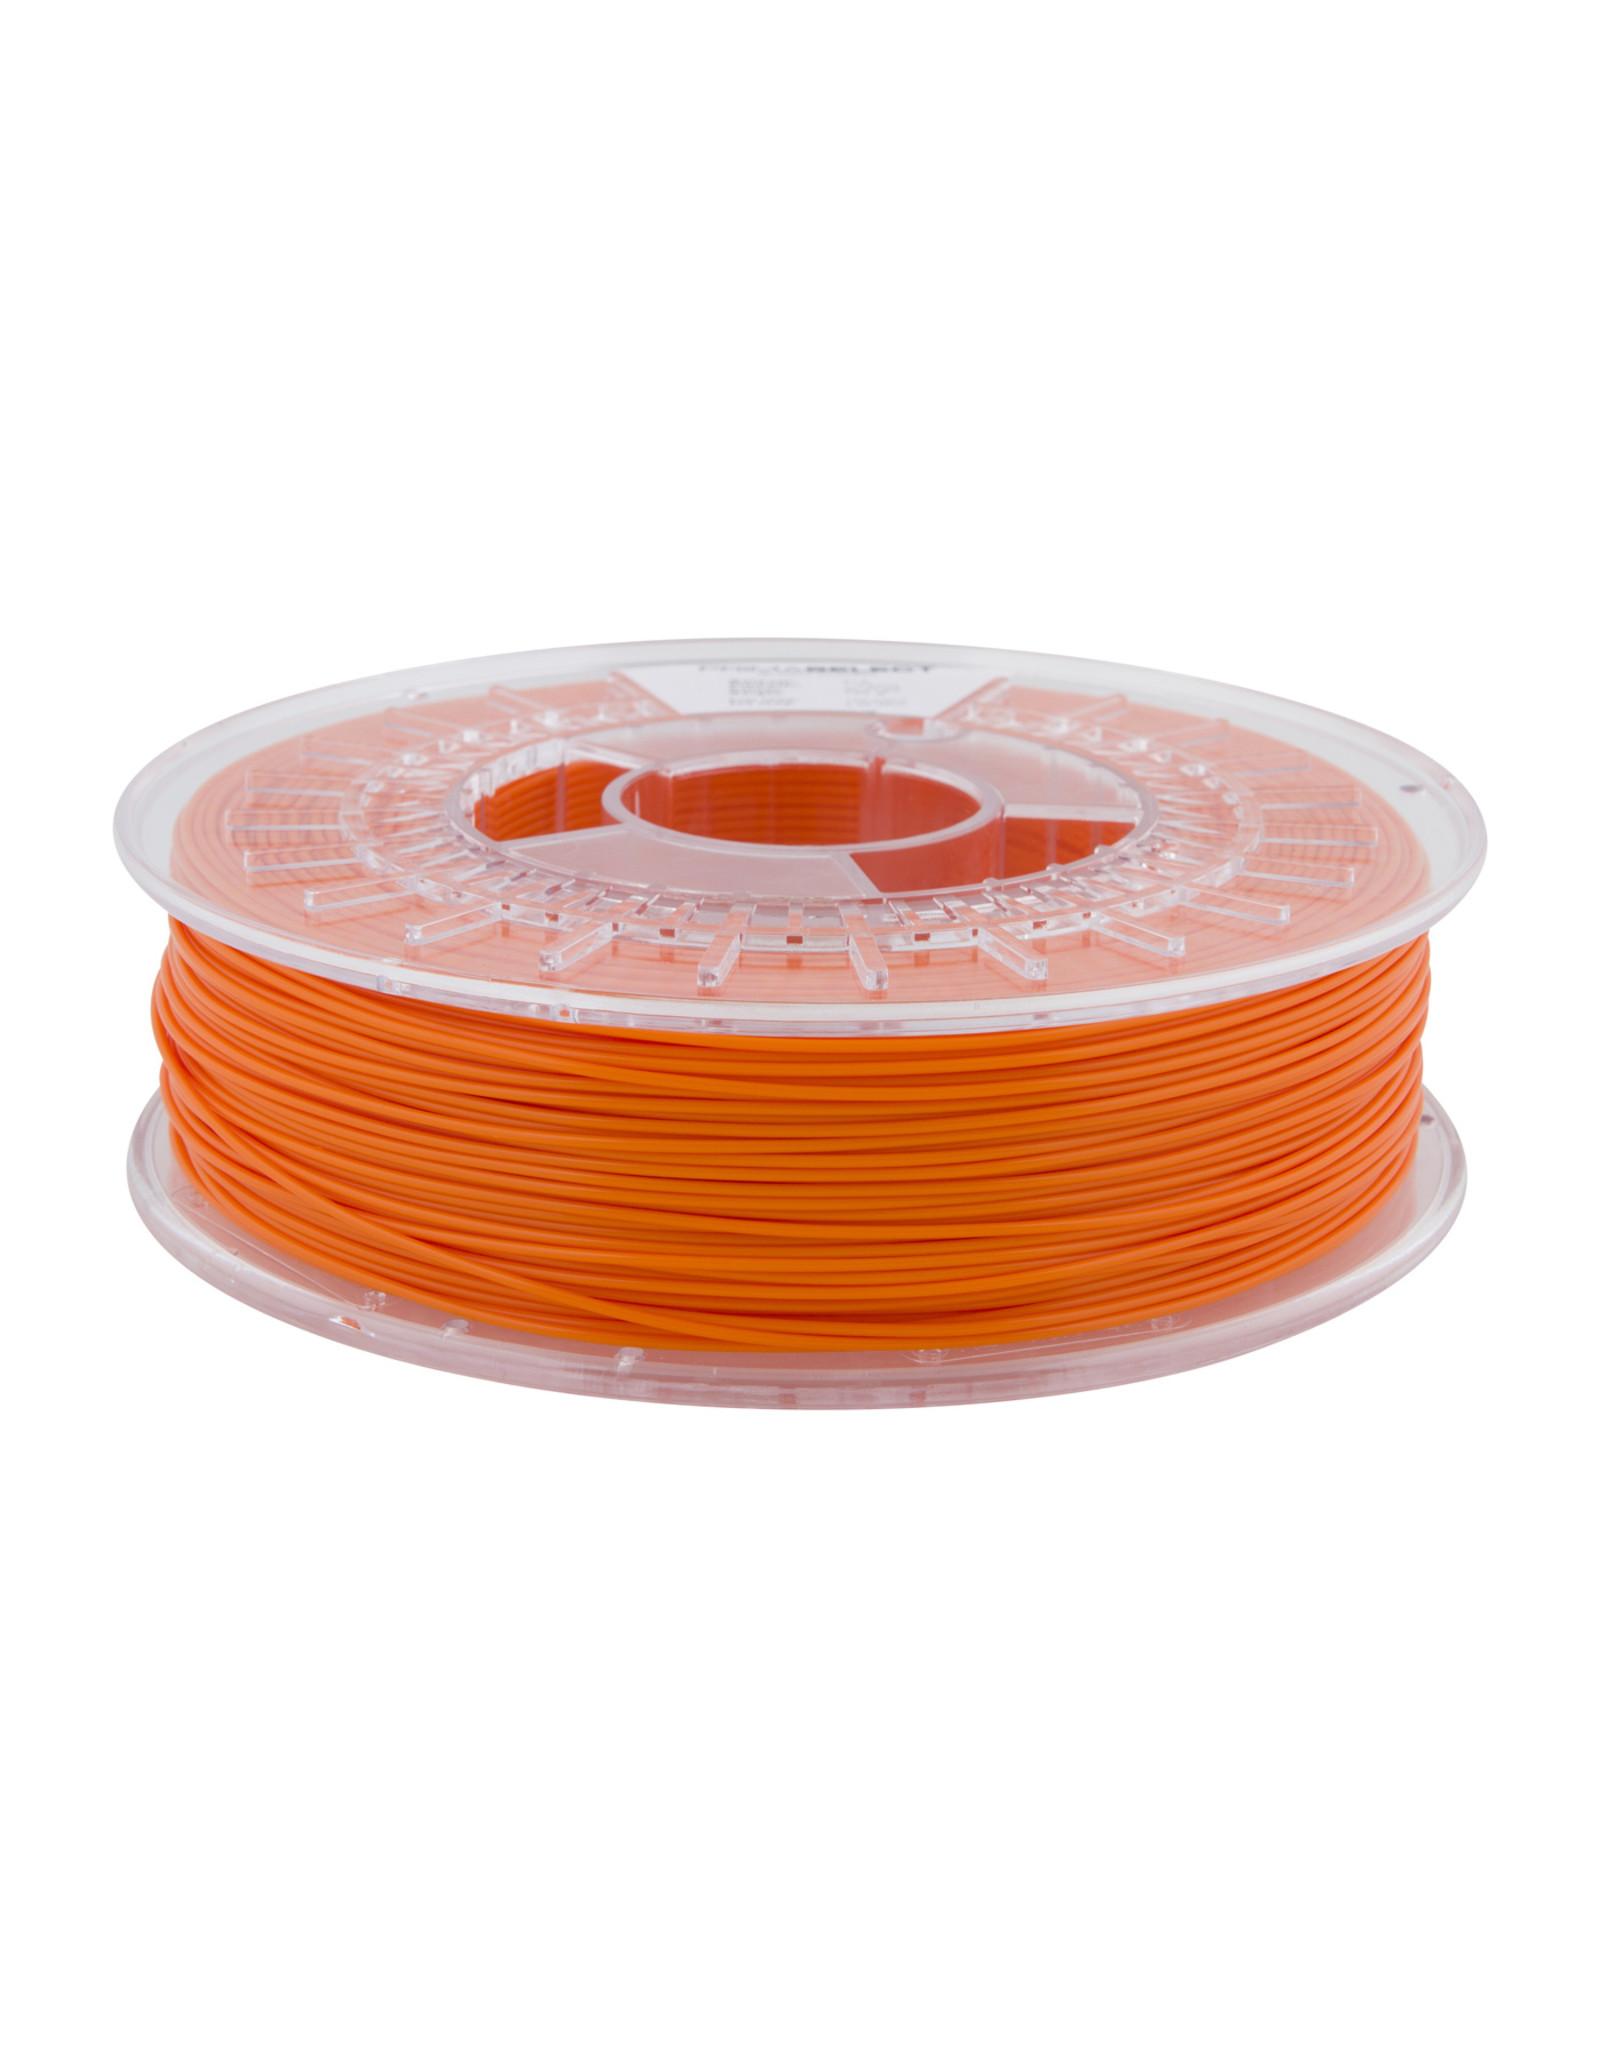 Prima PrimaSelect PLA 1.75mm - 750gr Orange